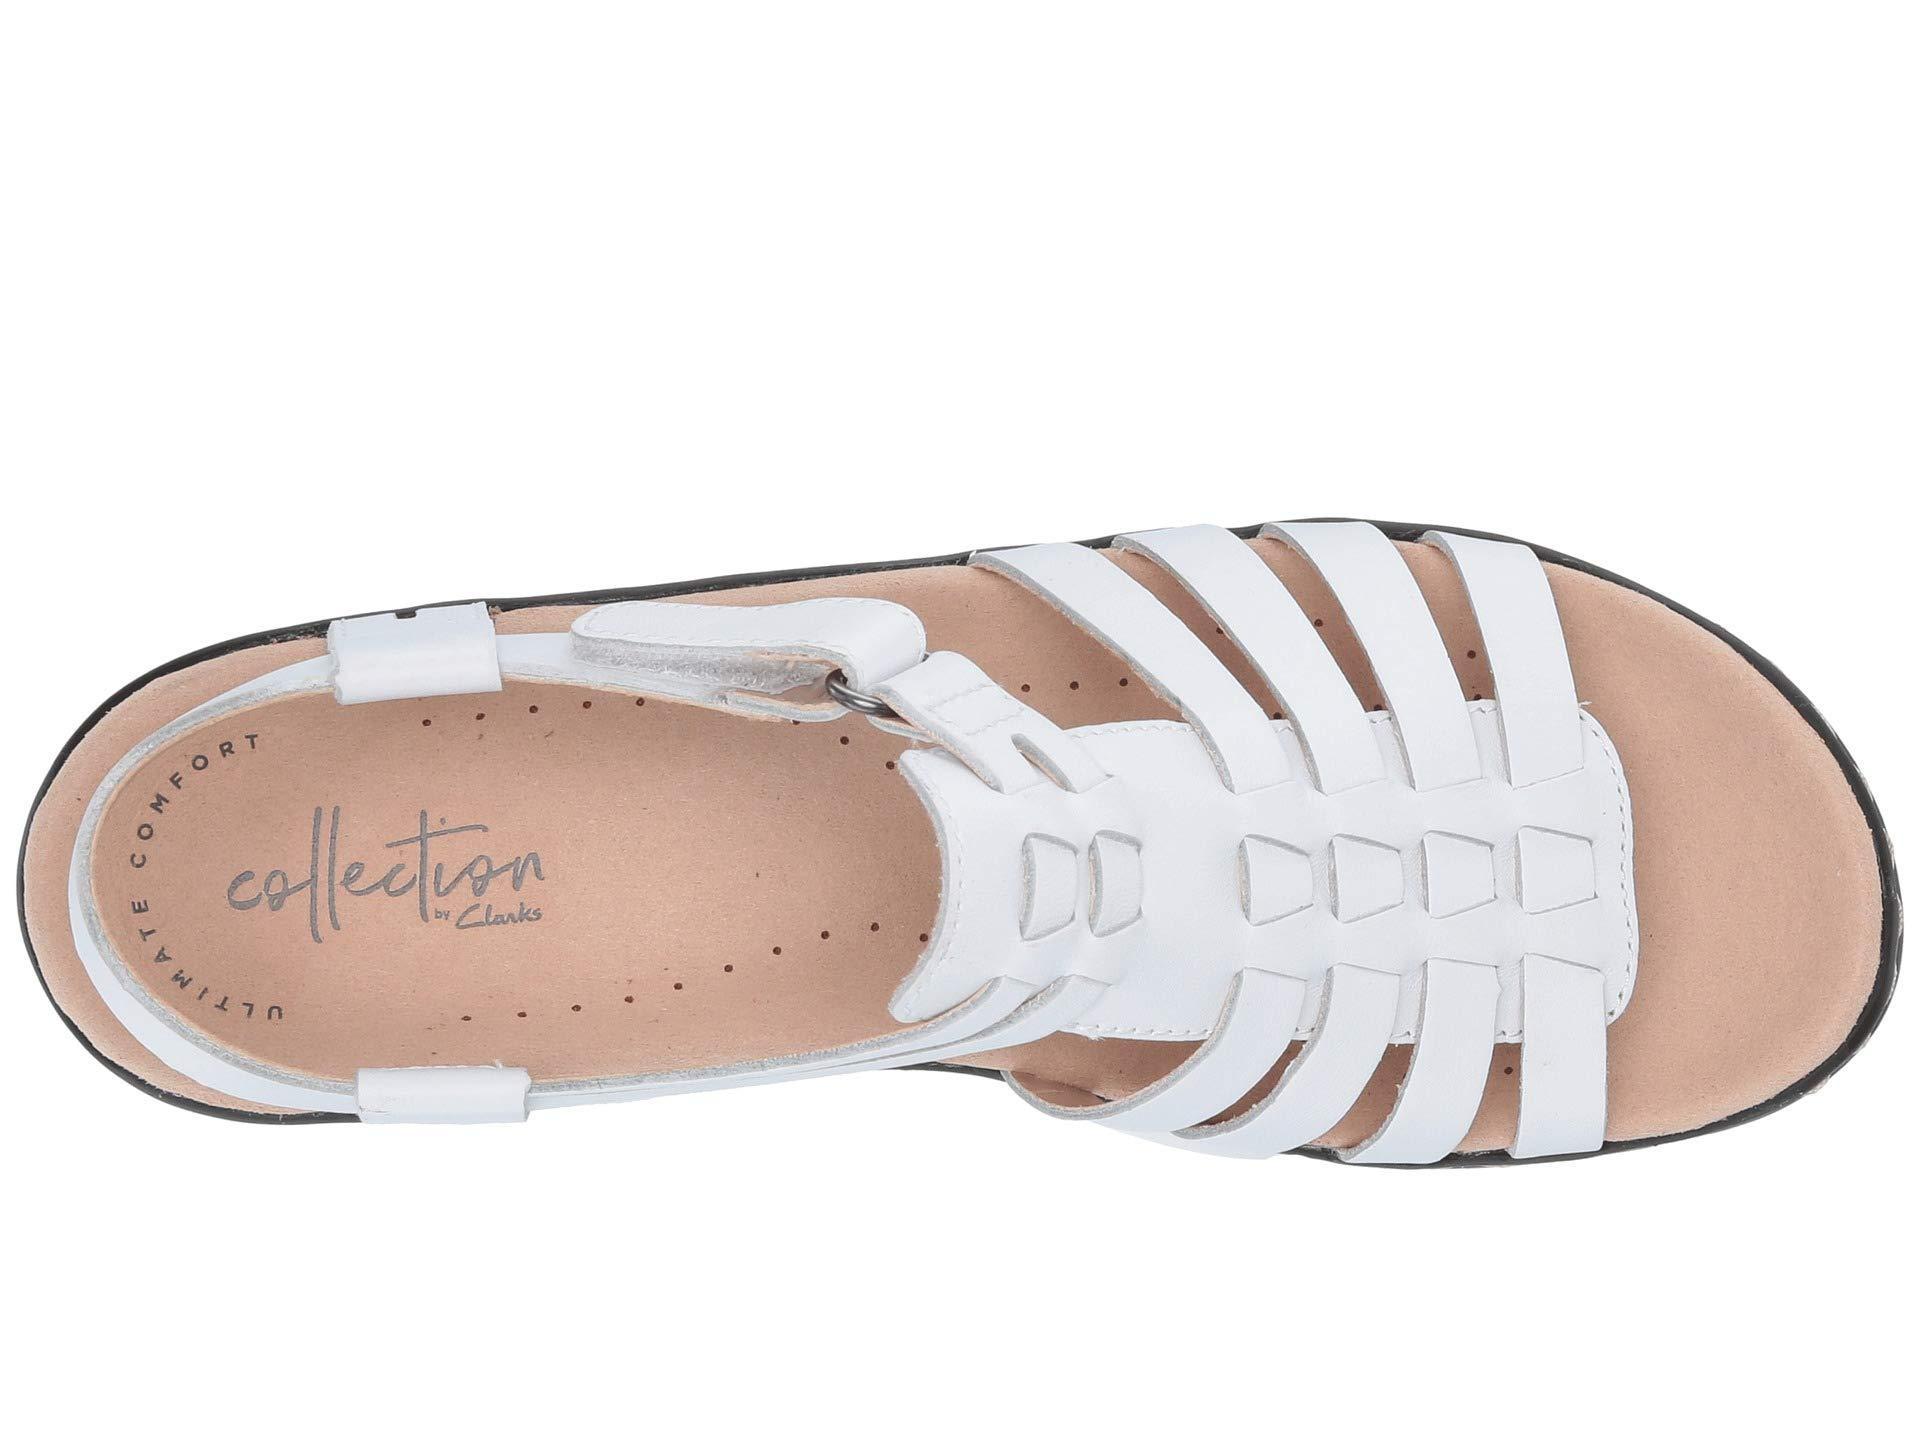 7105ff49e1f Clarks - Multicolor Lexi Bridge (white Leather) Women s Dress Sandals -  Lyst. View fullscreen